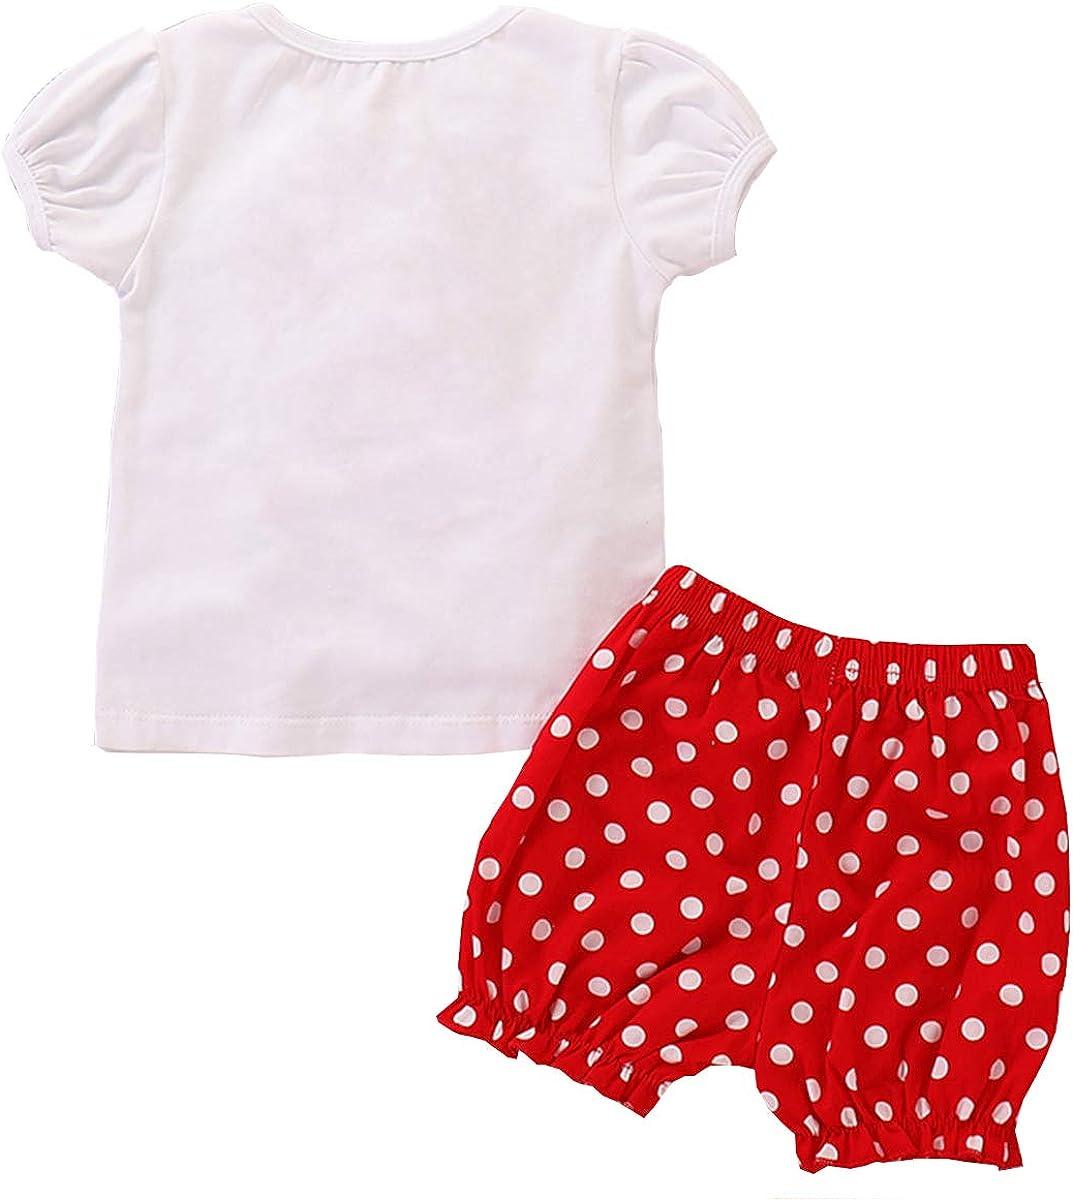 FYMNSI Toddler Kids Baby Girl Birthday Party Cake Smash Outfit Summer Short Sleeve T Shirt Top Ear Bow Headband 3pcs Clothes Set Photo Props 1-5Y Red Polka Dots Shorts Pants